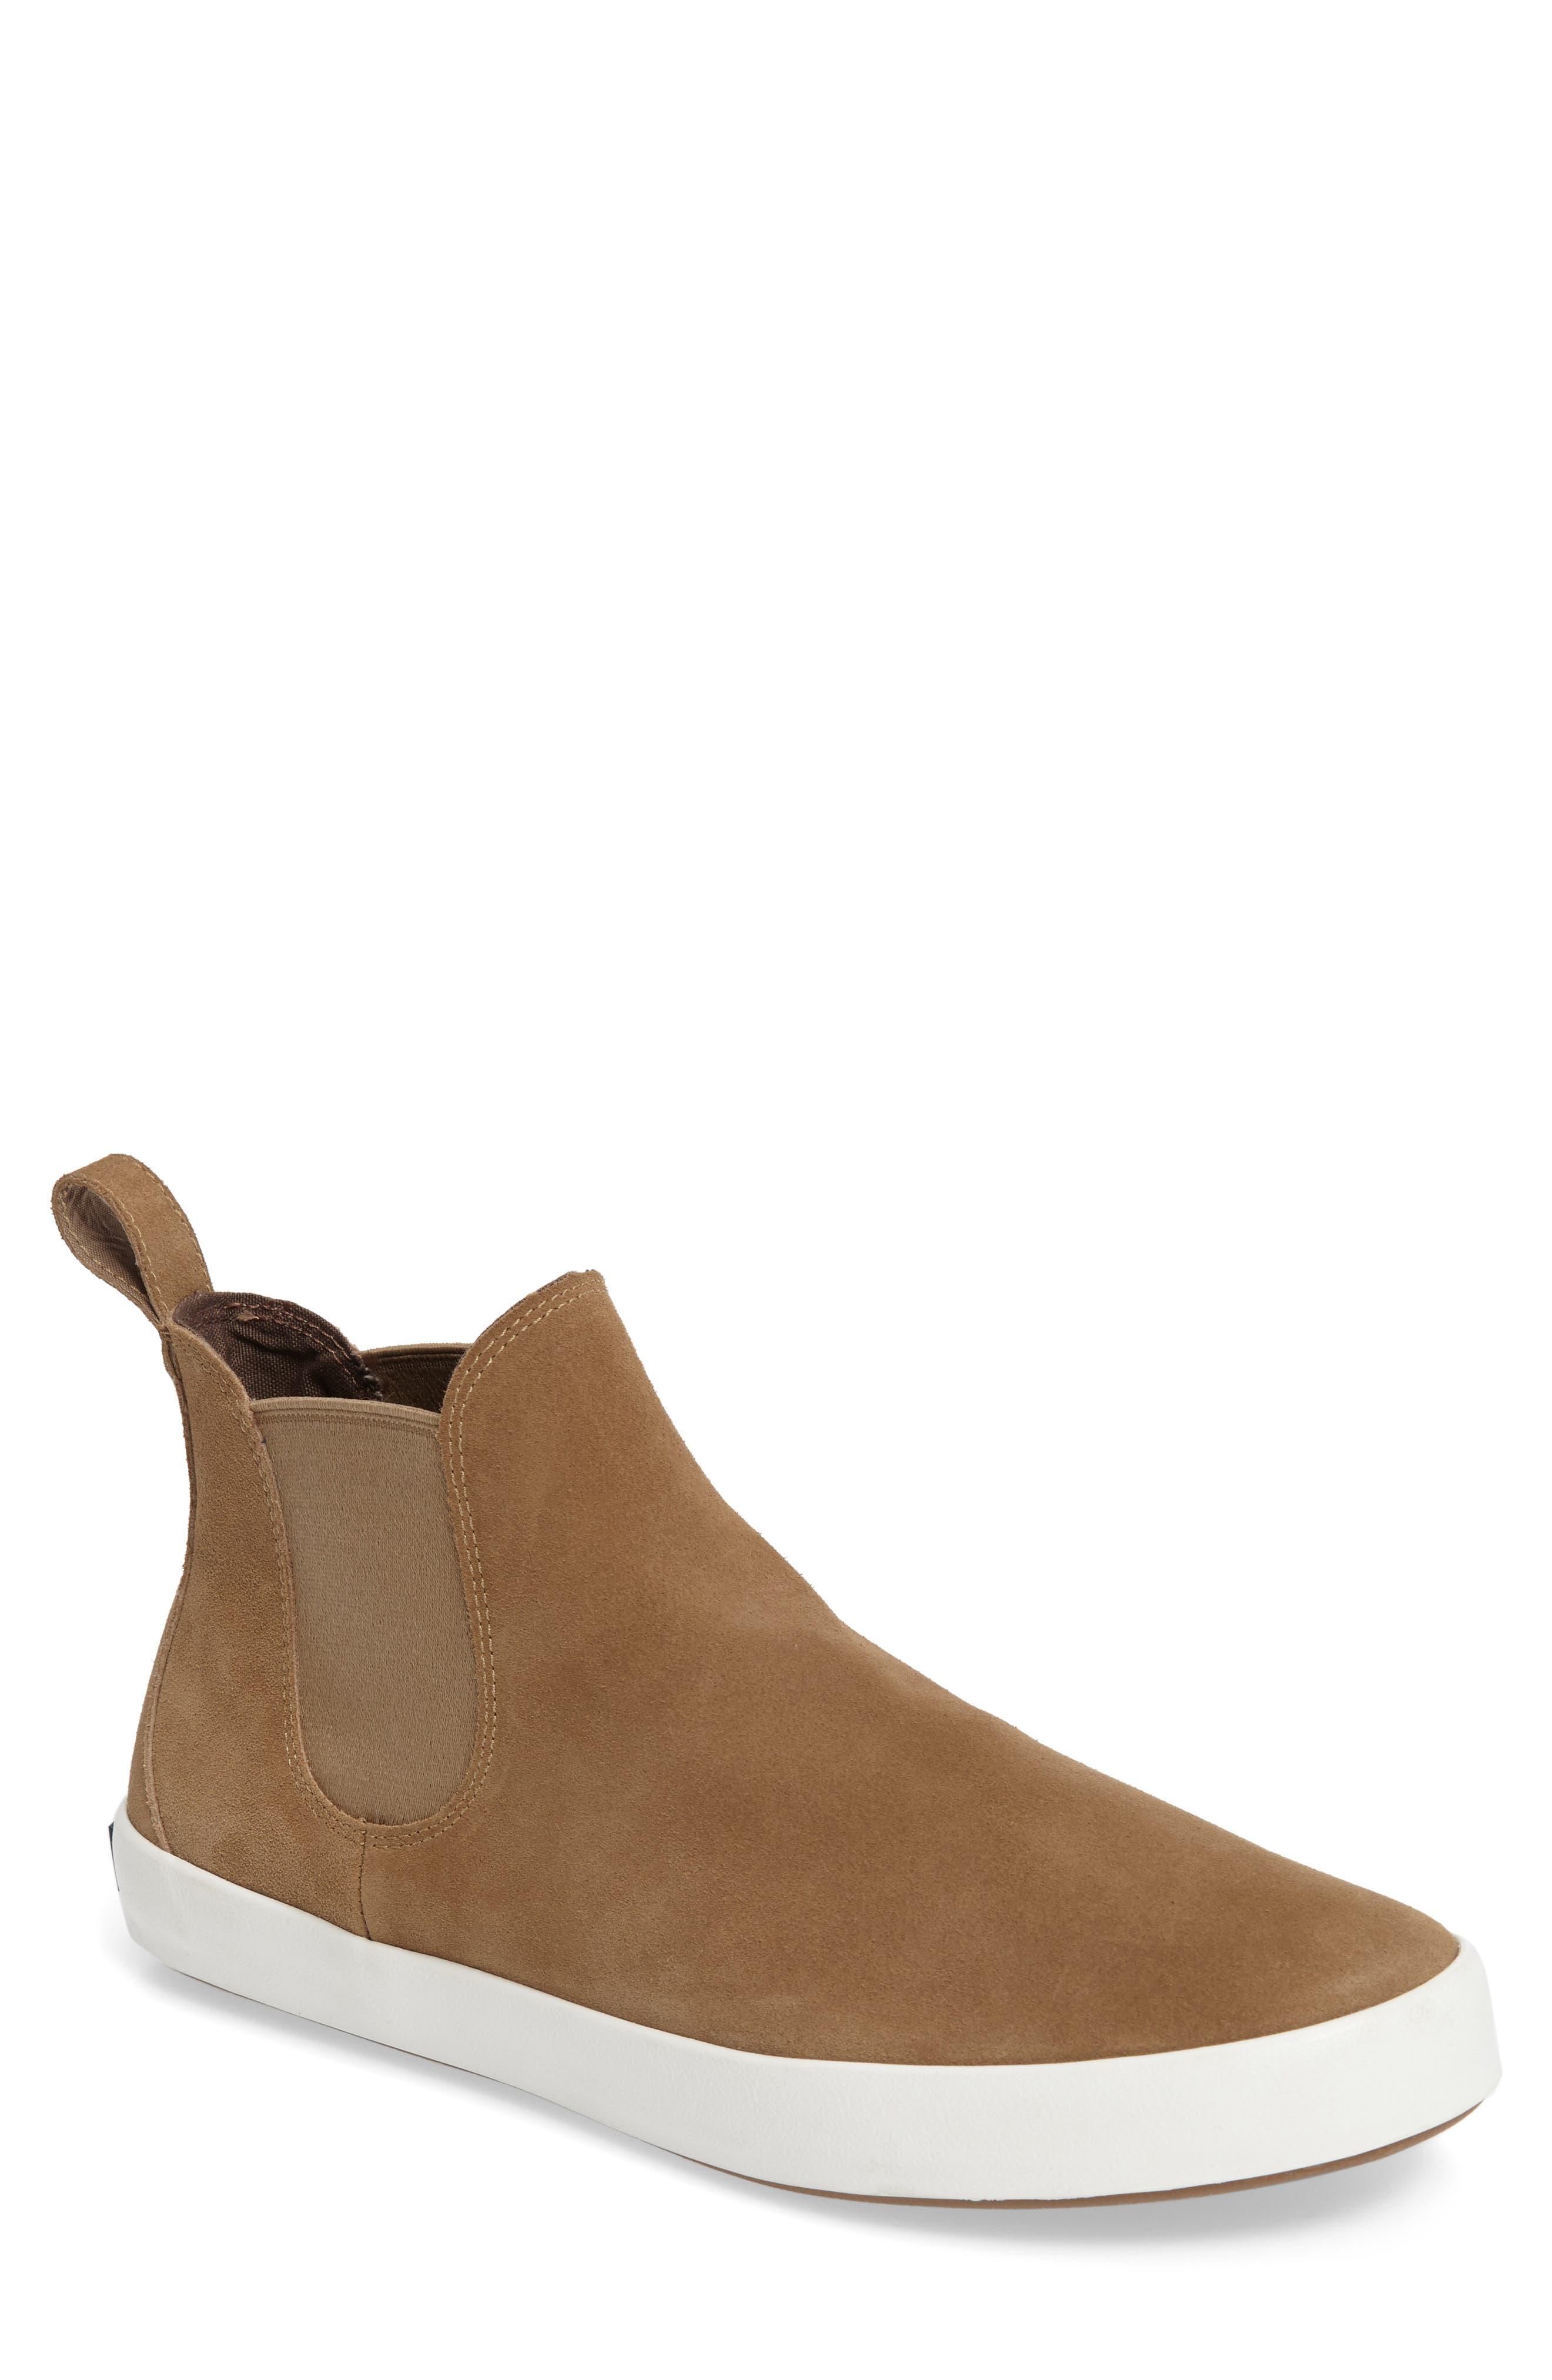 Main Image - Sperry Wahoo Chelsea Sneaker Boot (Men)